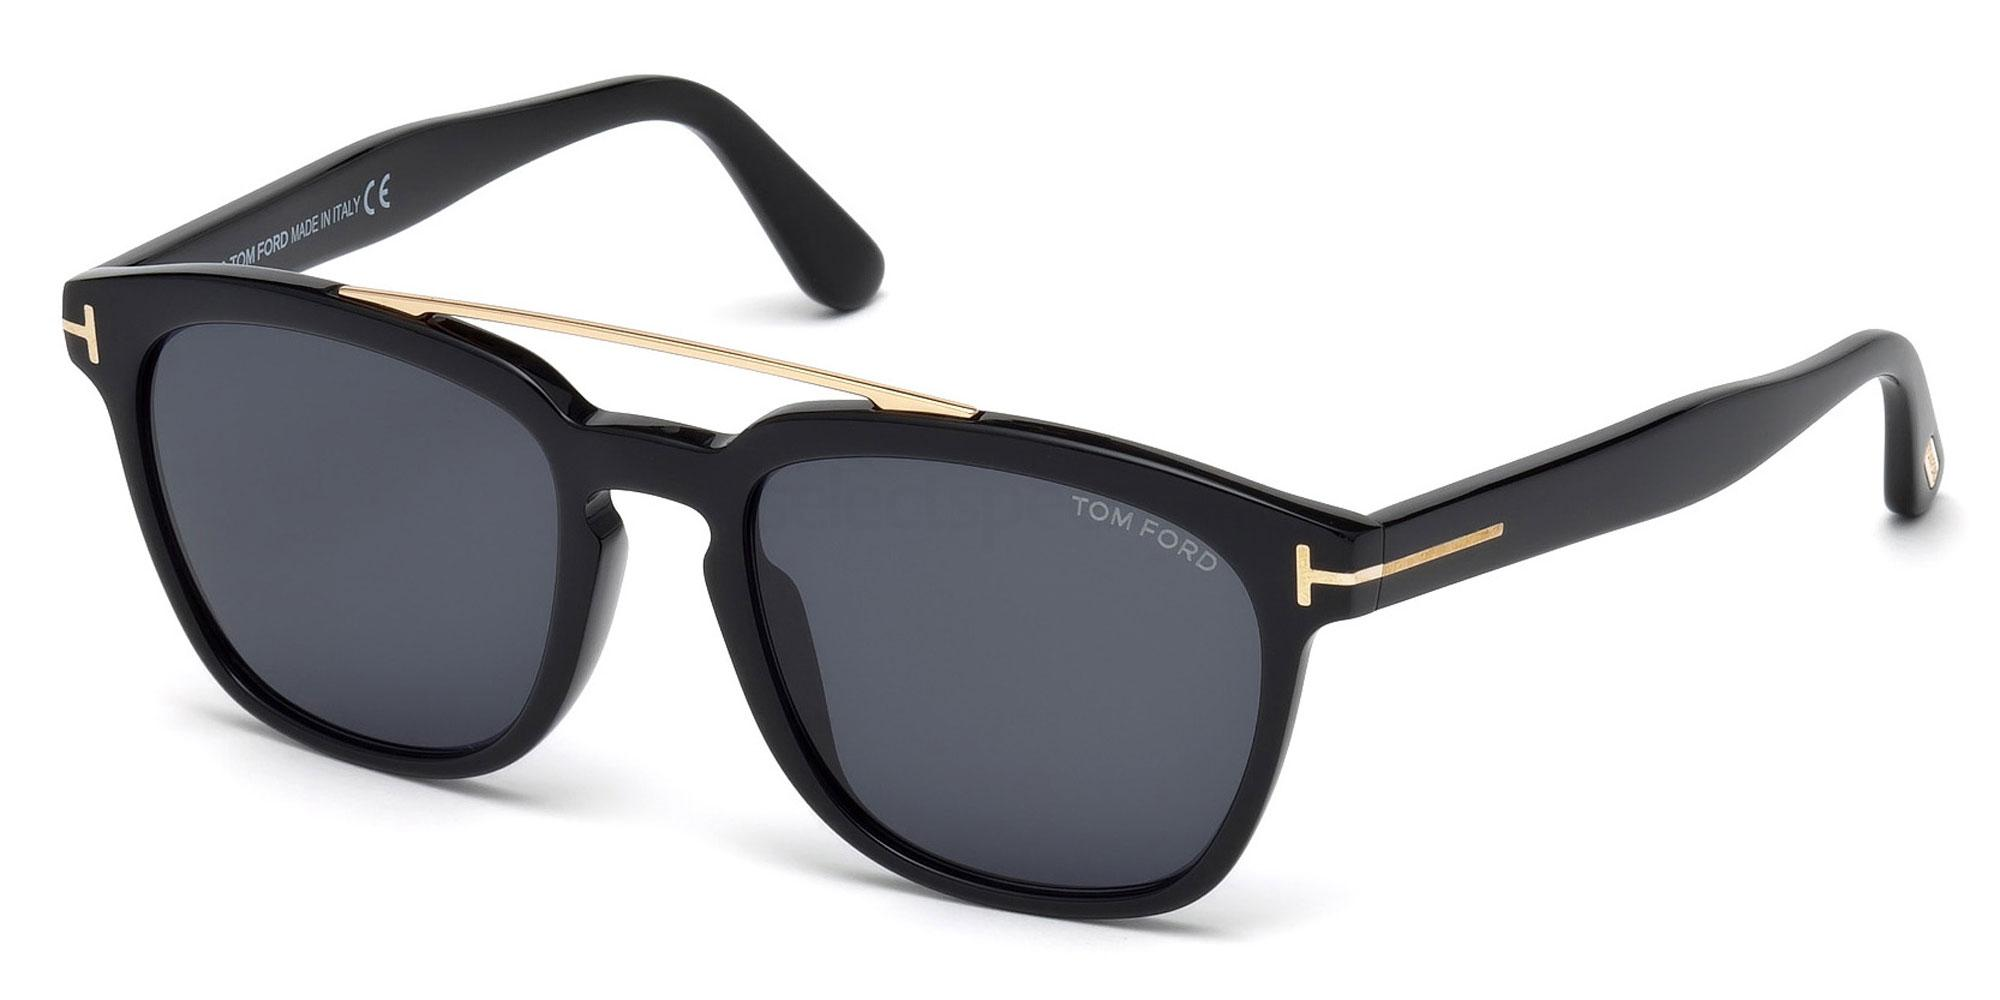 01A FT0516 Sunglasses, Tom Ford